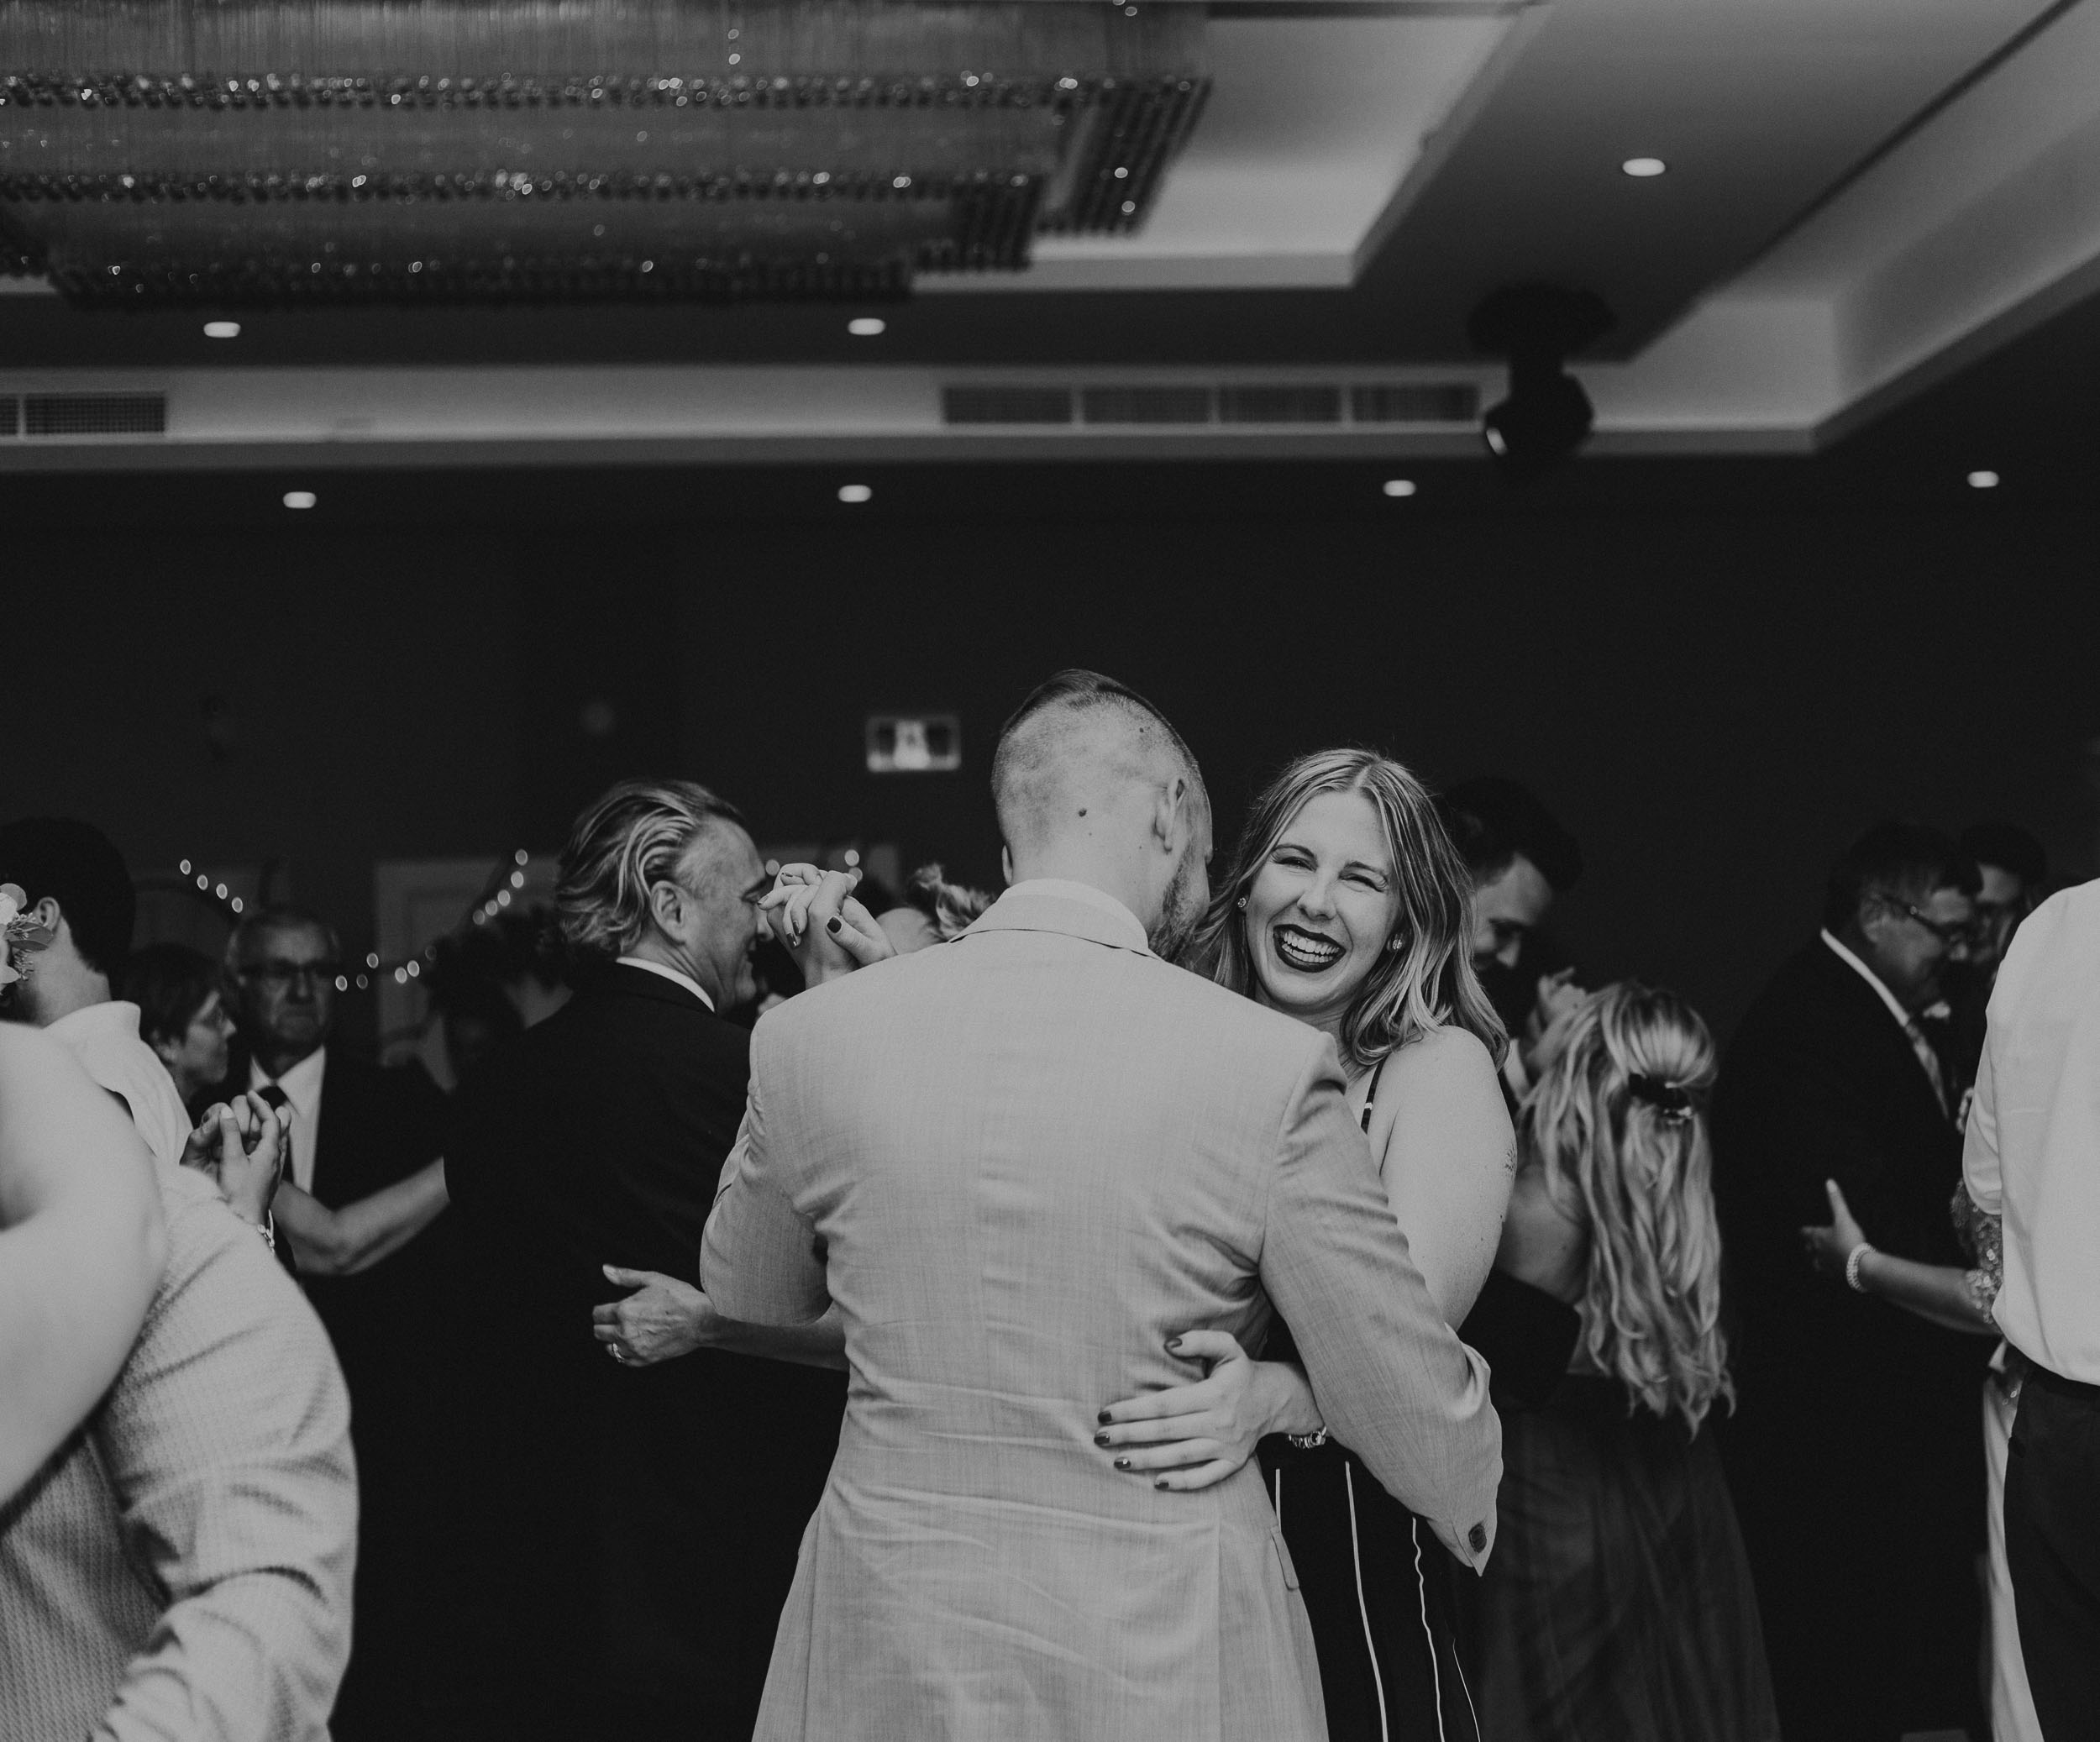 intimate-wedding-elopement-photographer-ottawa-toronto-8673.jpg